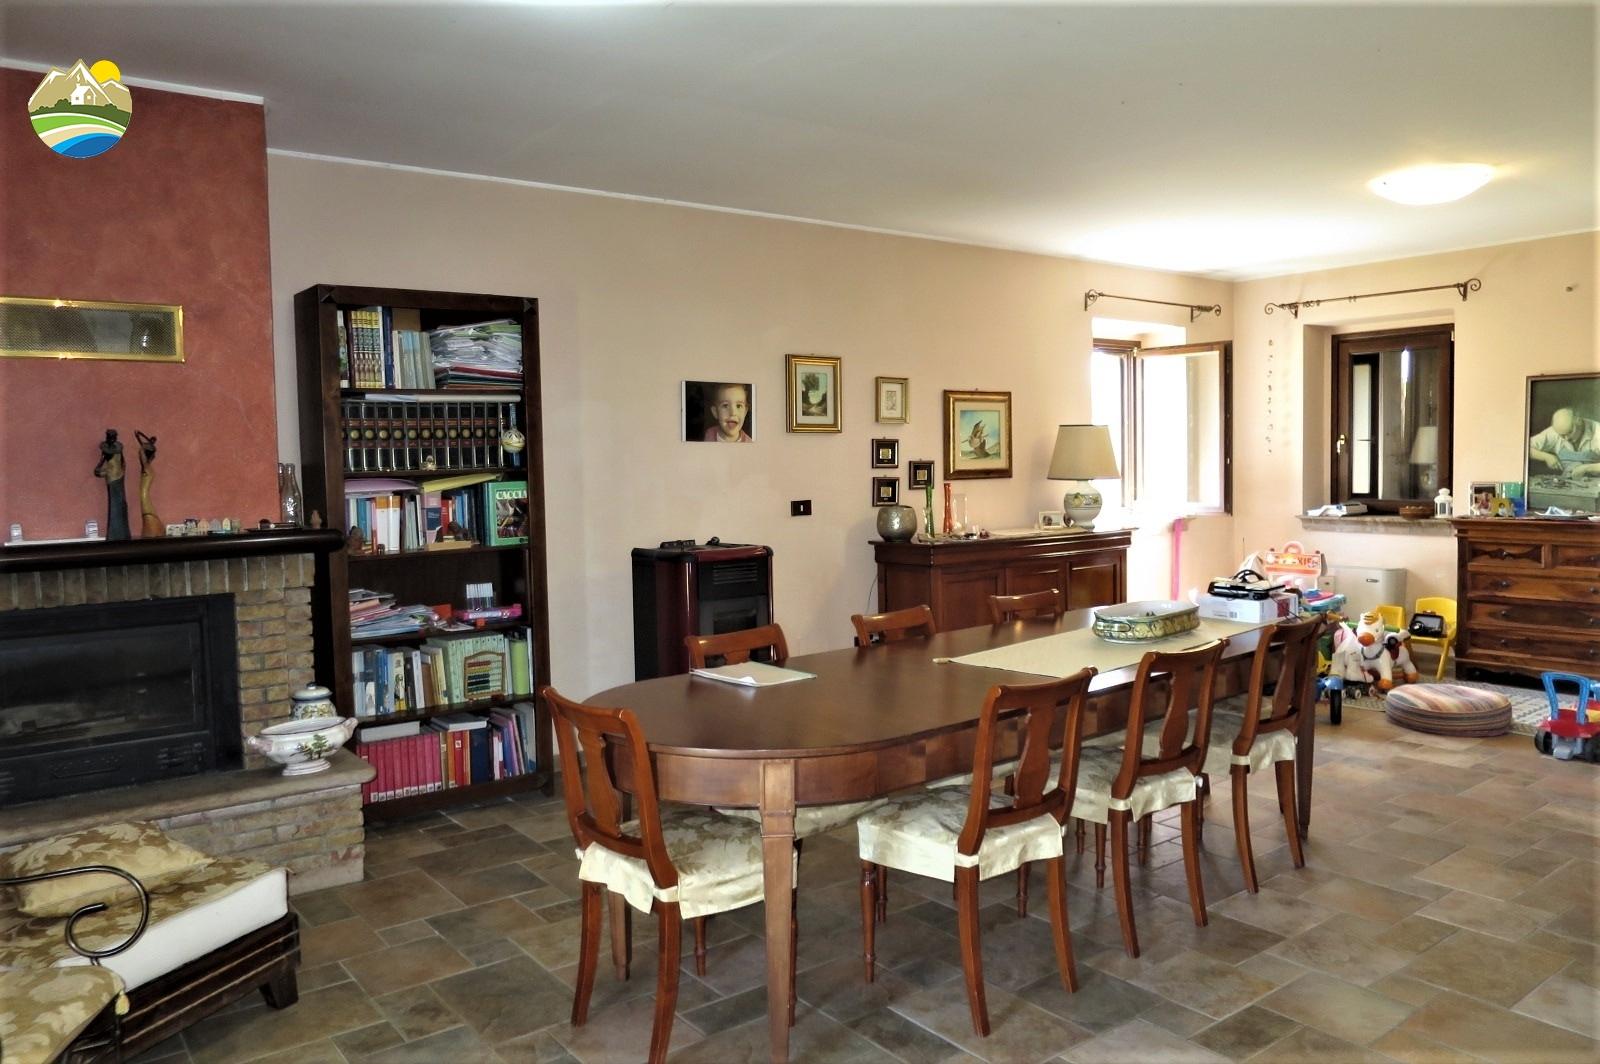 Country Houses Country Houses for sale Morro D'Oro (TE), Casa del Moro - Morro D'Oro - EUR 327.141 420